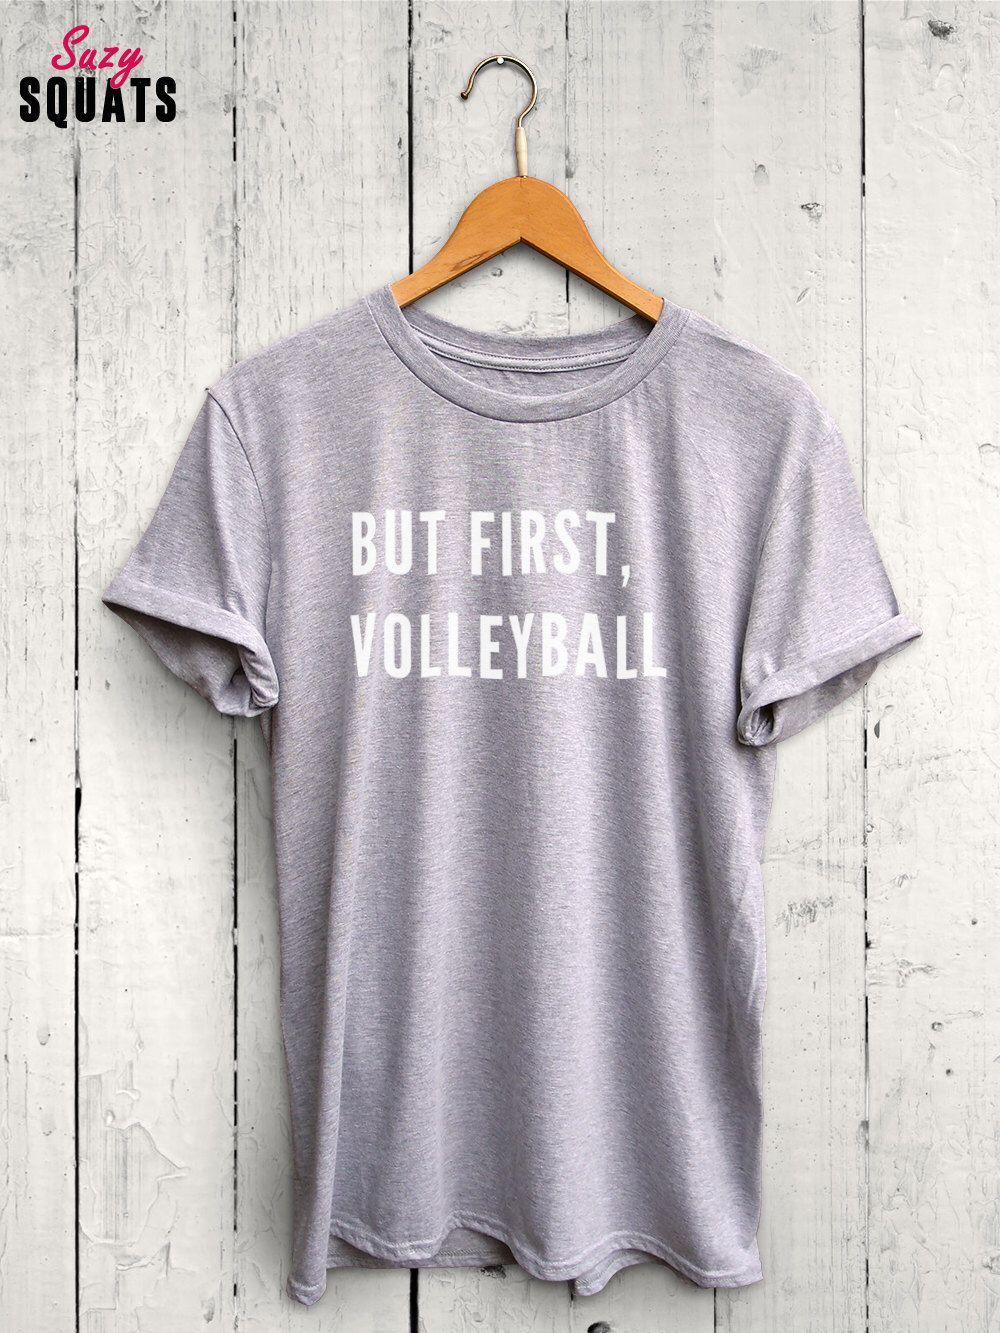 But First Volleyball Shirt Volleyball T Shirt Funny Volleyball Shirt Volleyball Tank Top Vol Womens Workout Shirts Funny Volleyball Shirts Funny Gym Shirts